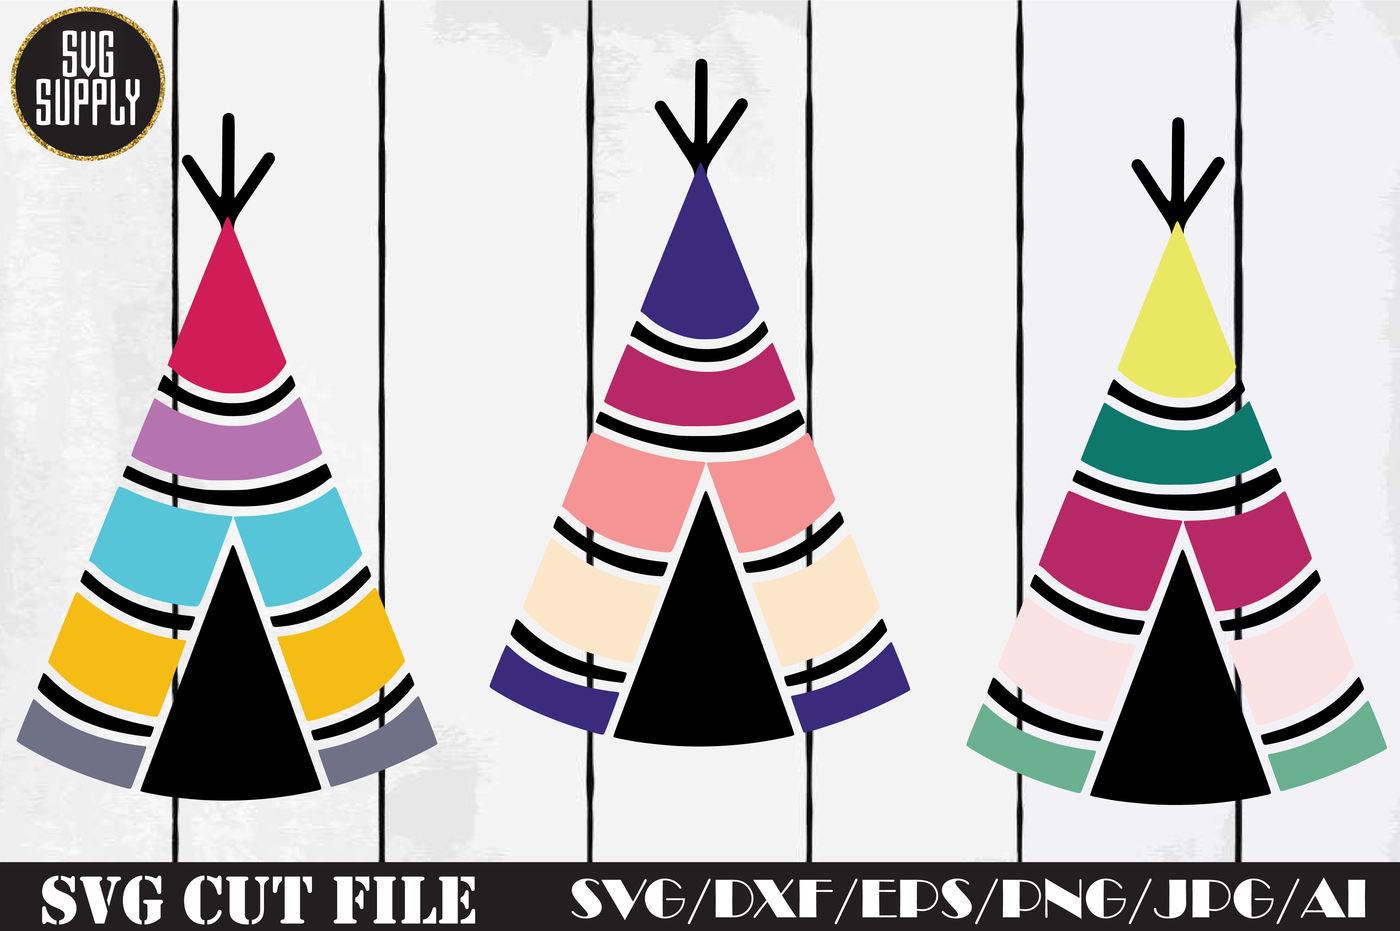 Boho Tent Svg Cut File By Svgsupply Thehungryjpeg Com